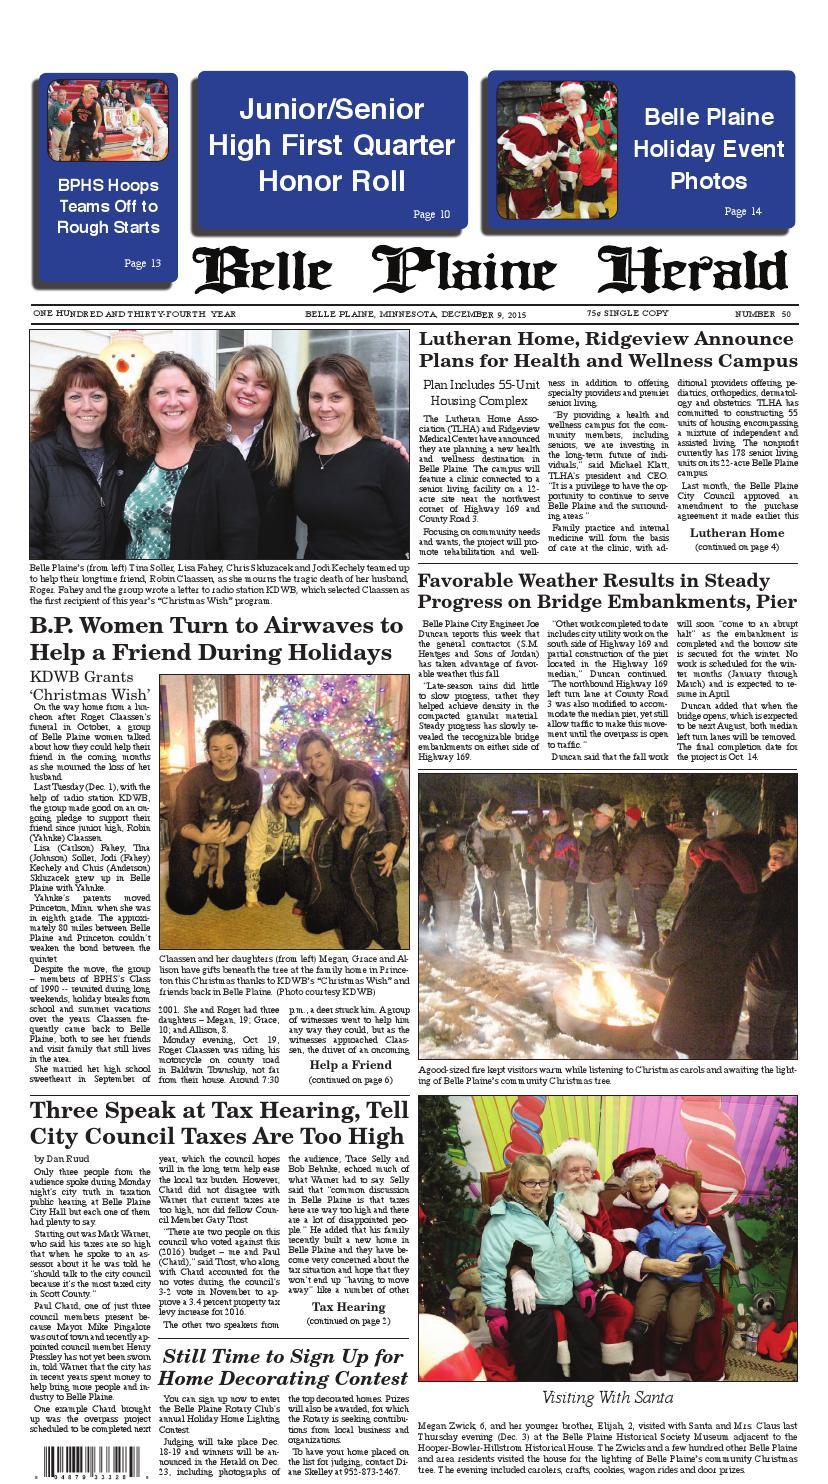 Belle plaine herald december 9, 2015 by Belle Plaine Herald - issuu